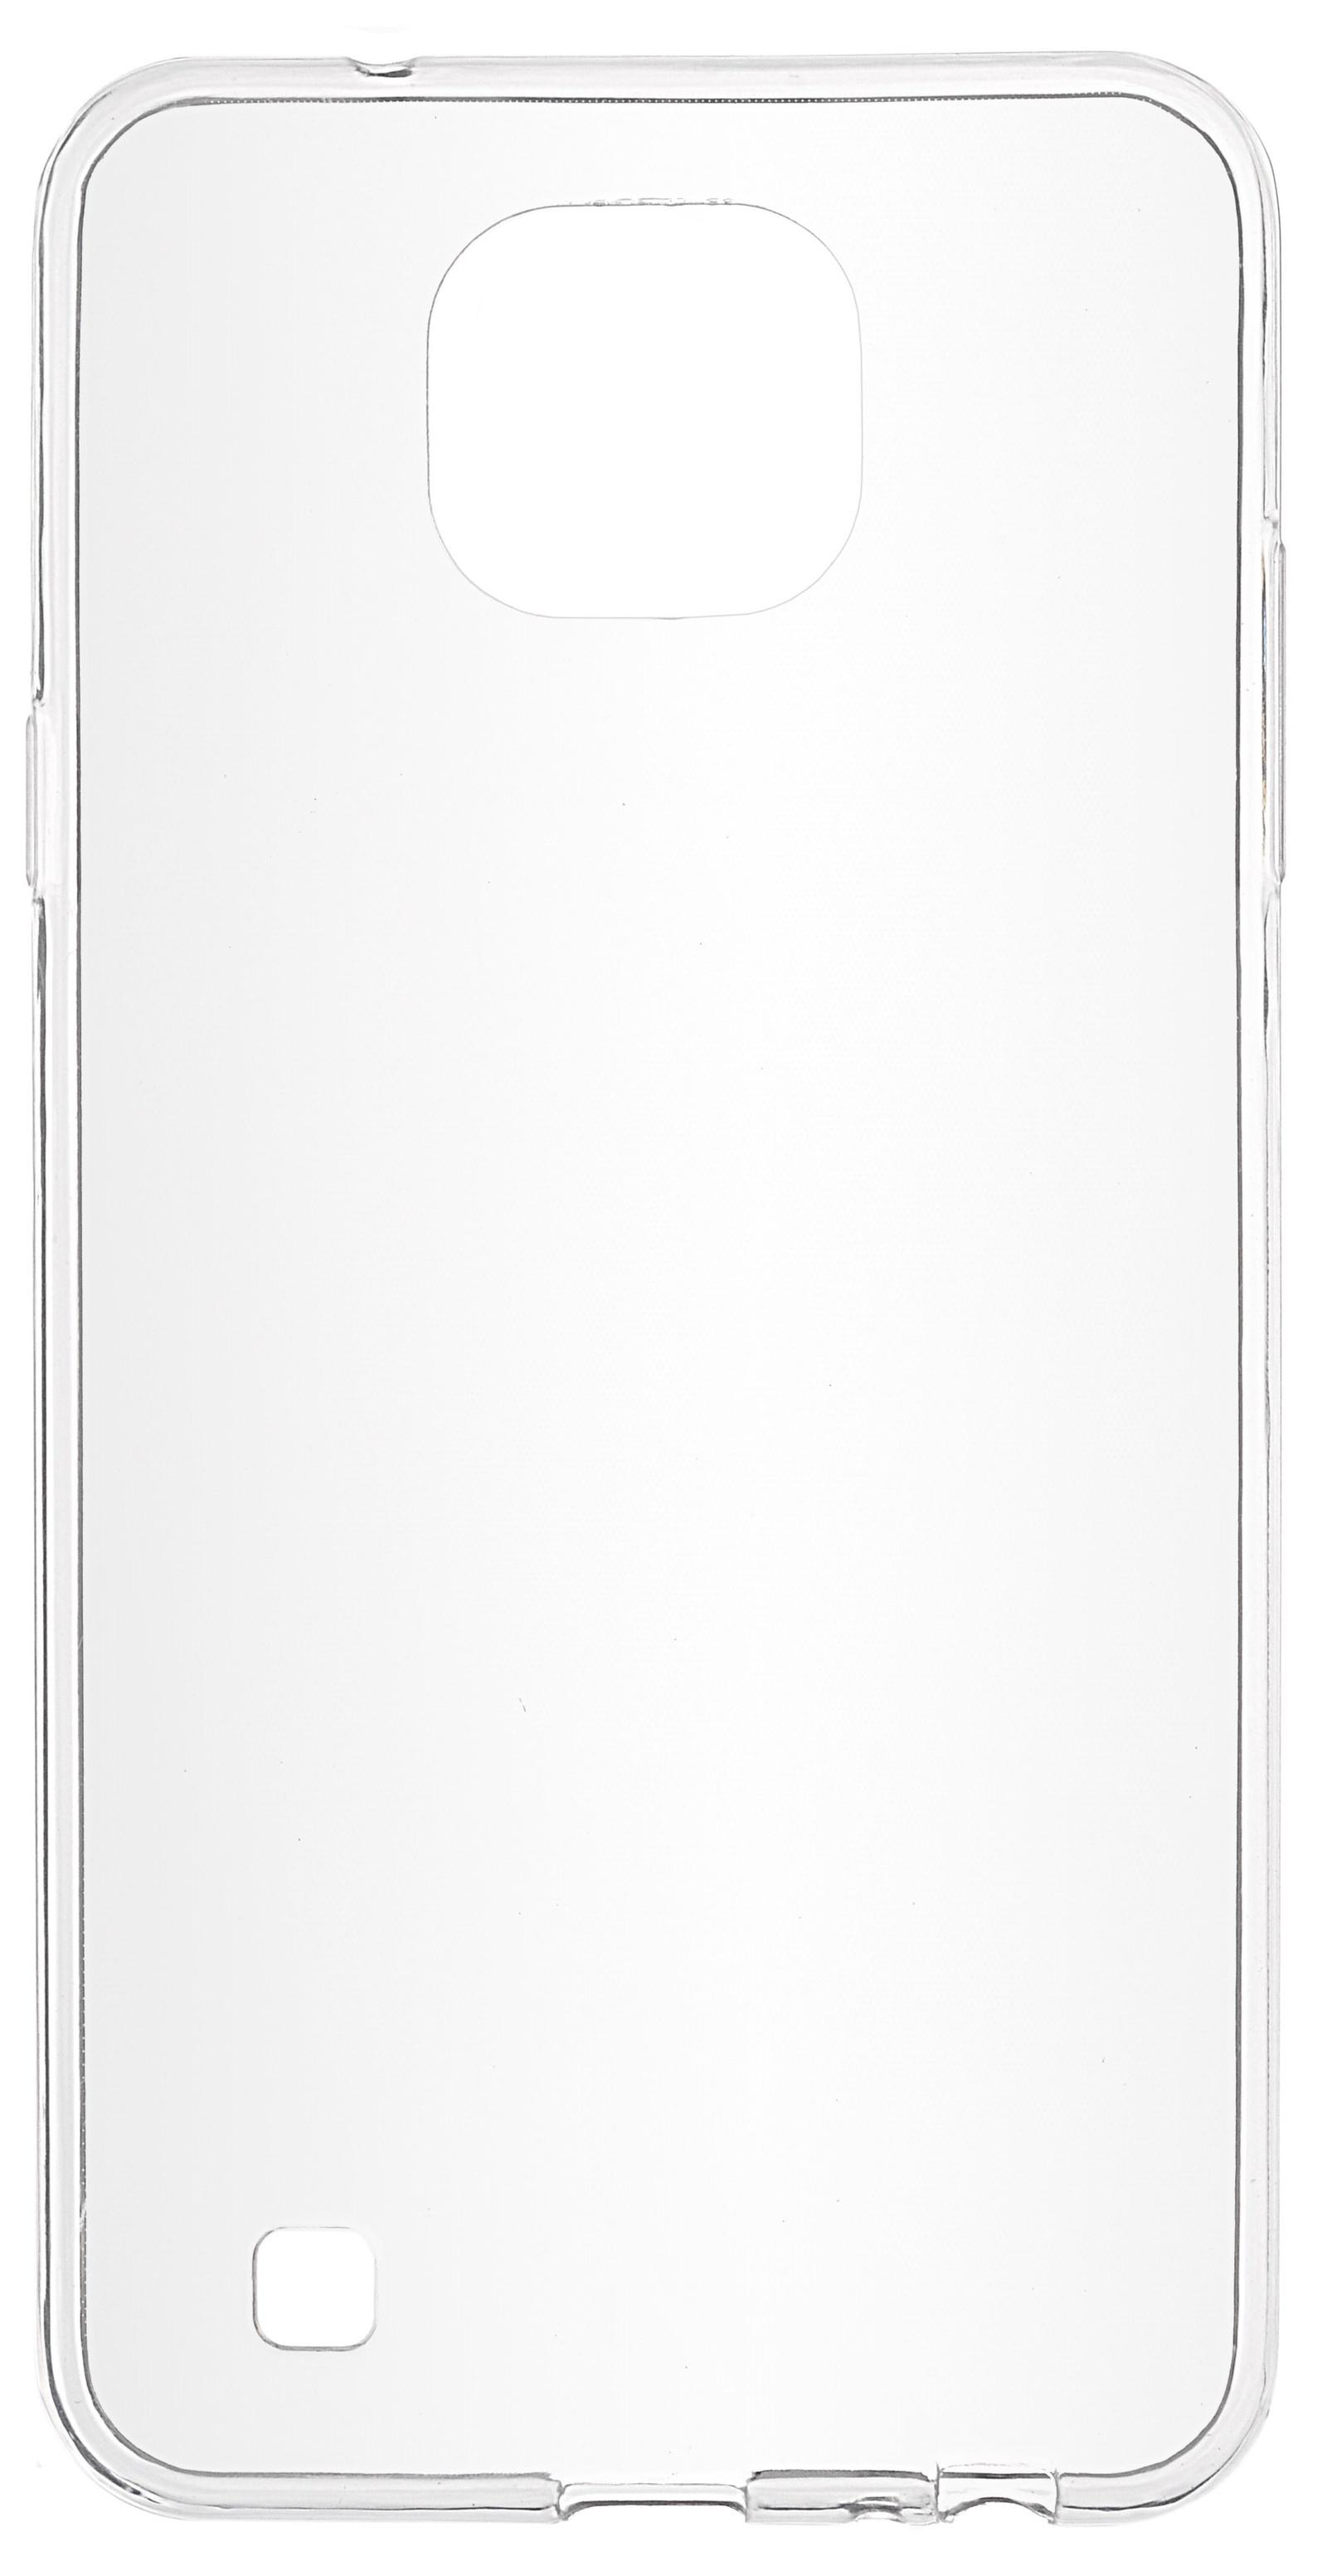 Чехол для сотового телефона skinBOX Slim Silicone, 4660041407686, прозрачный цена и фото